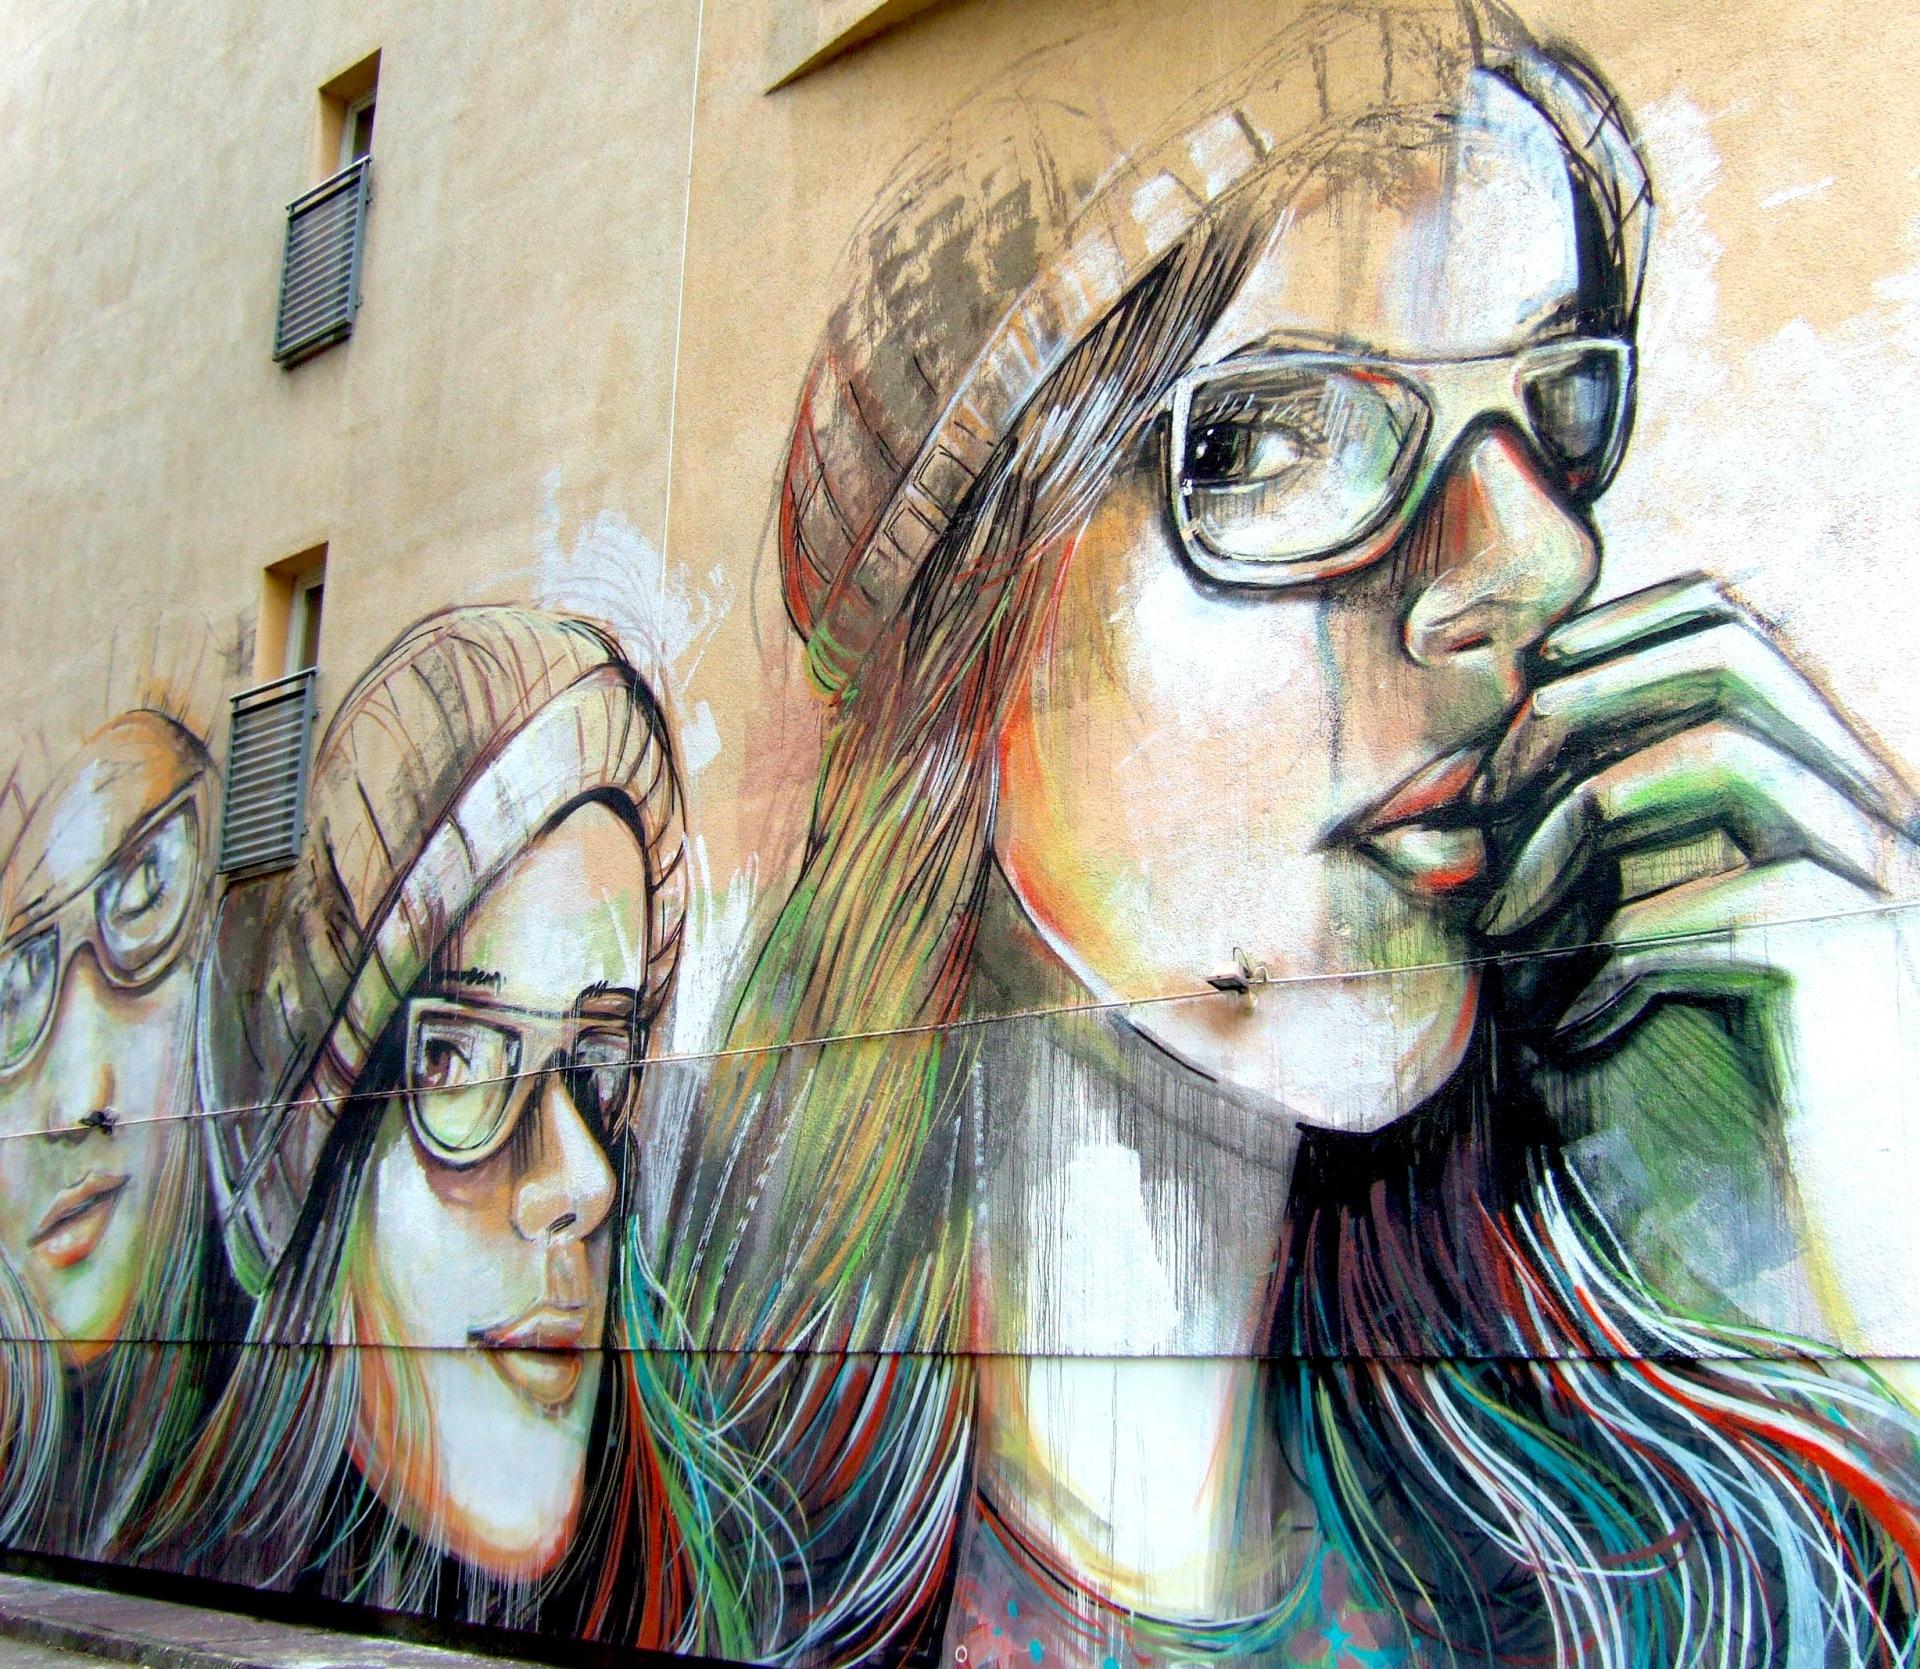 Street art on the Alternative Berlin tour